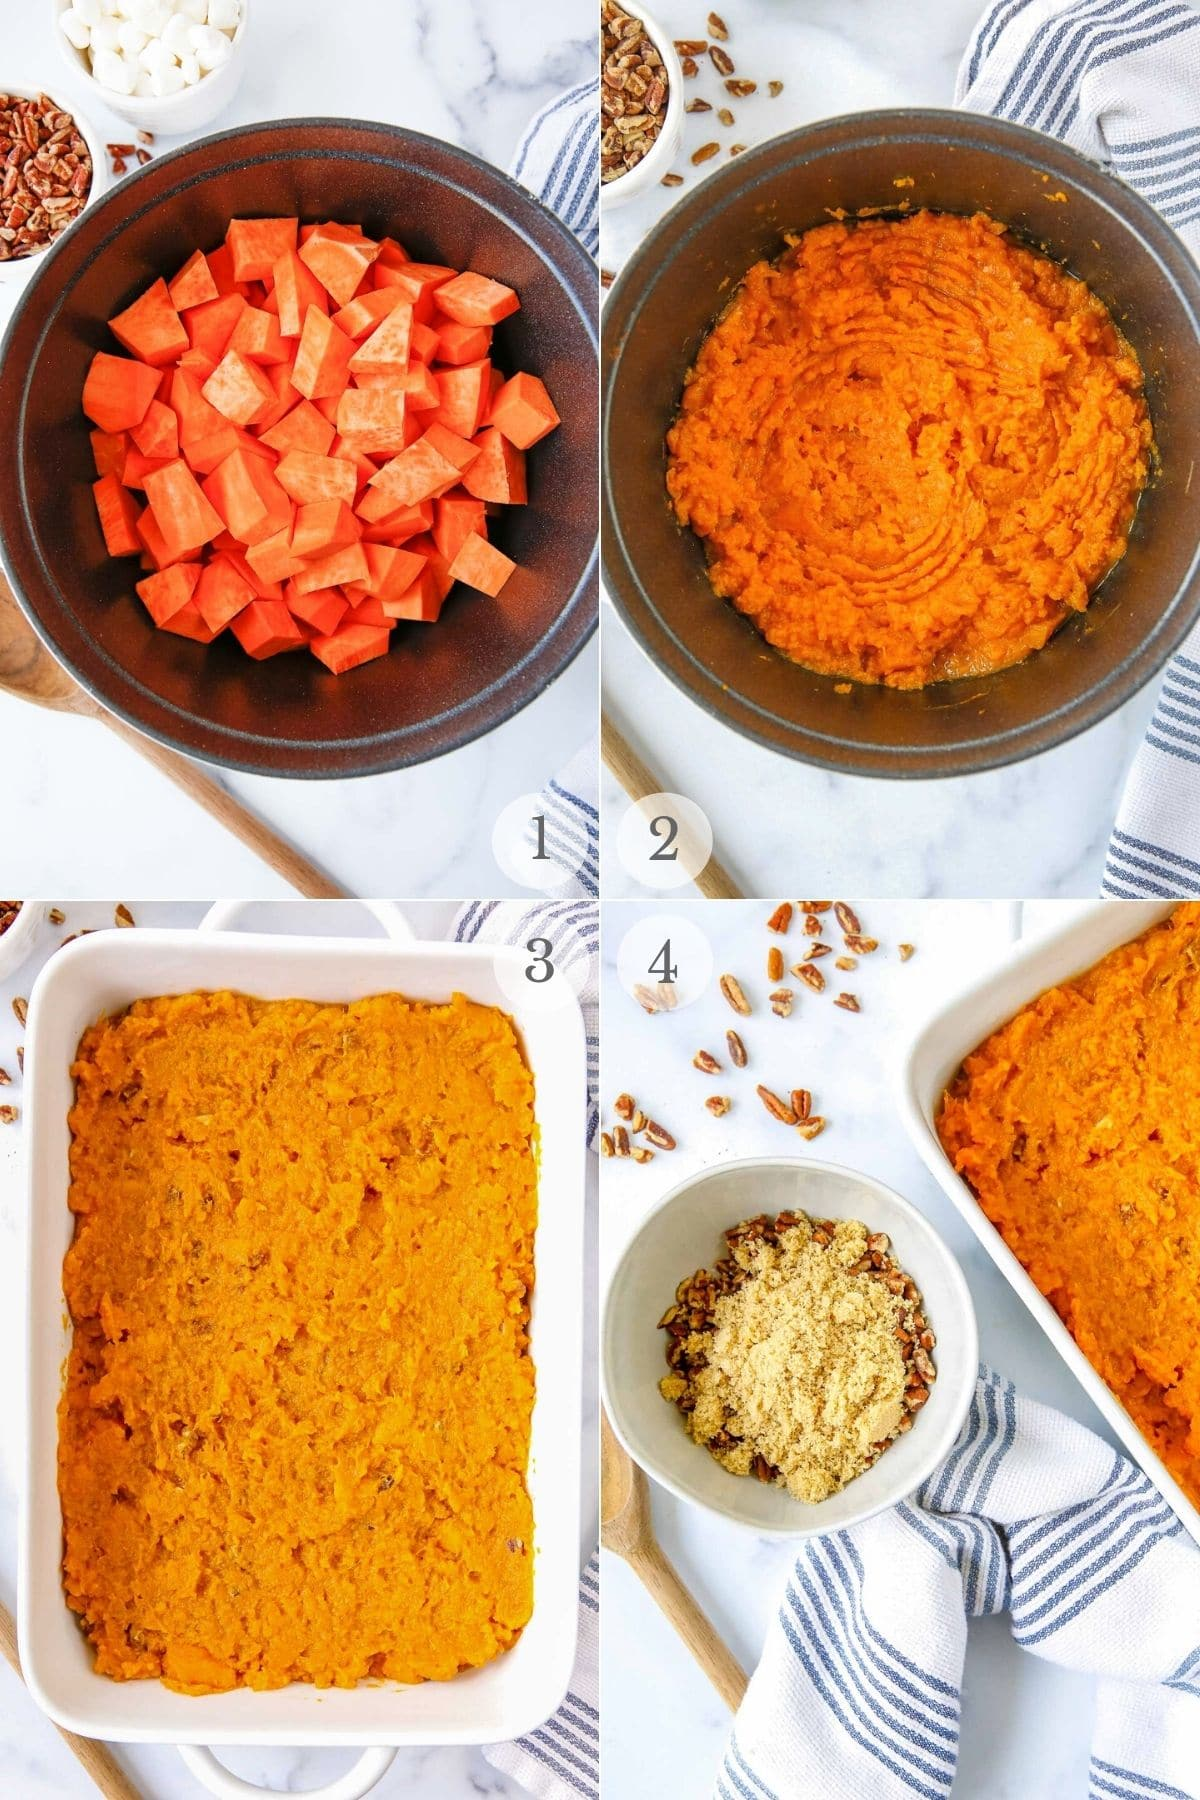 sweet potota casserole recipe steps 1-4